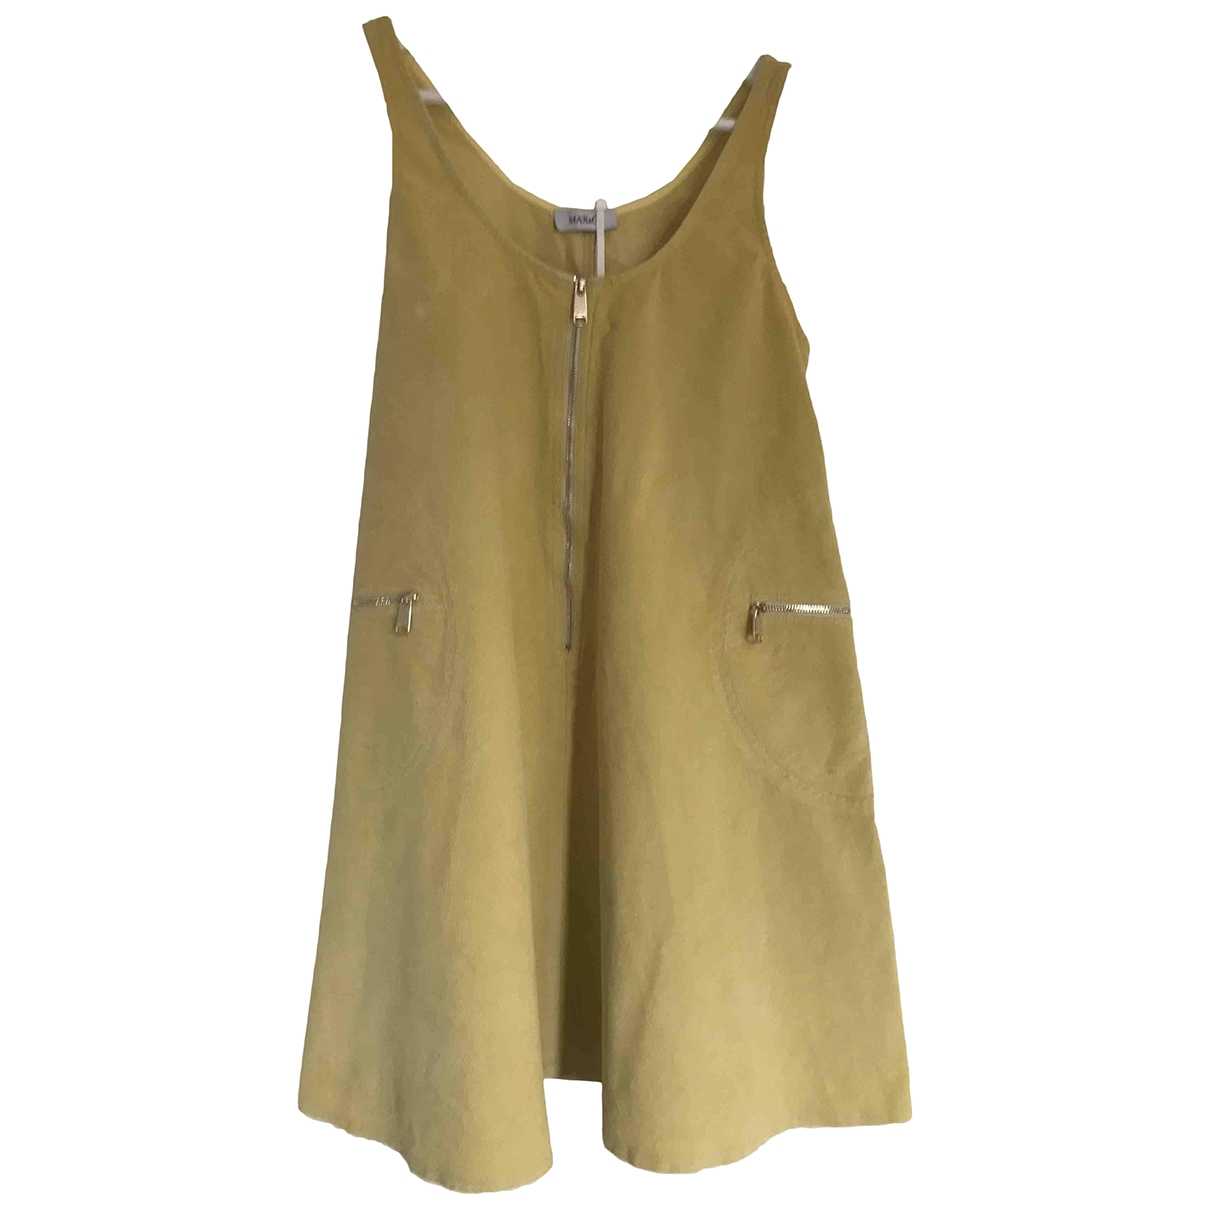 Max & Co \N Yellow Cotton - elasthane dress for Women 36 FR